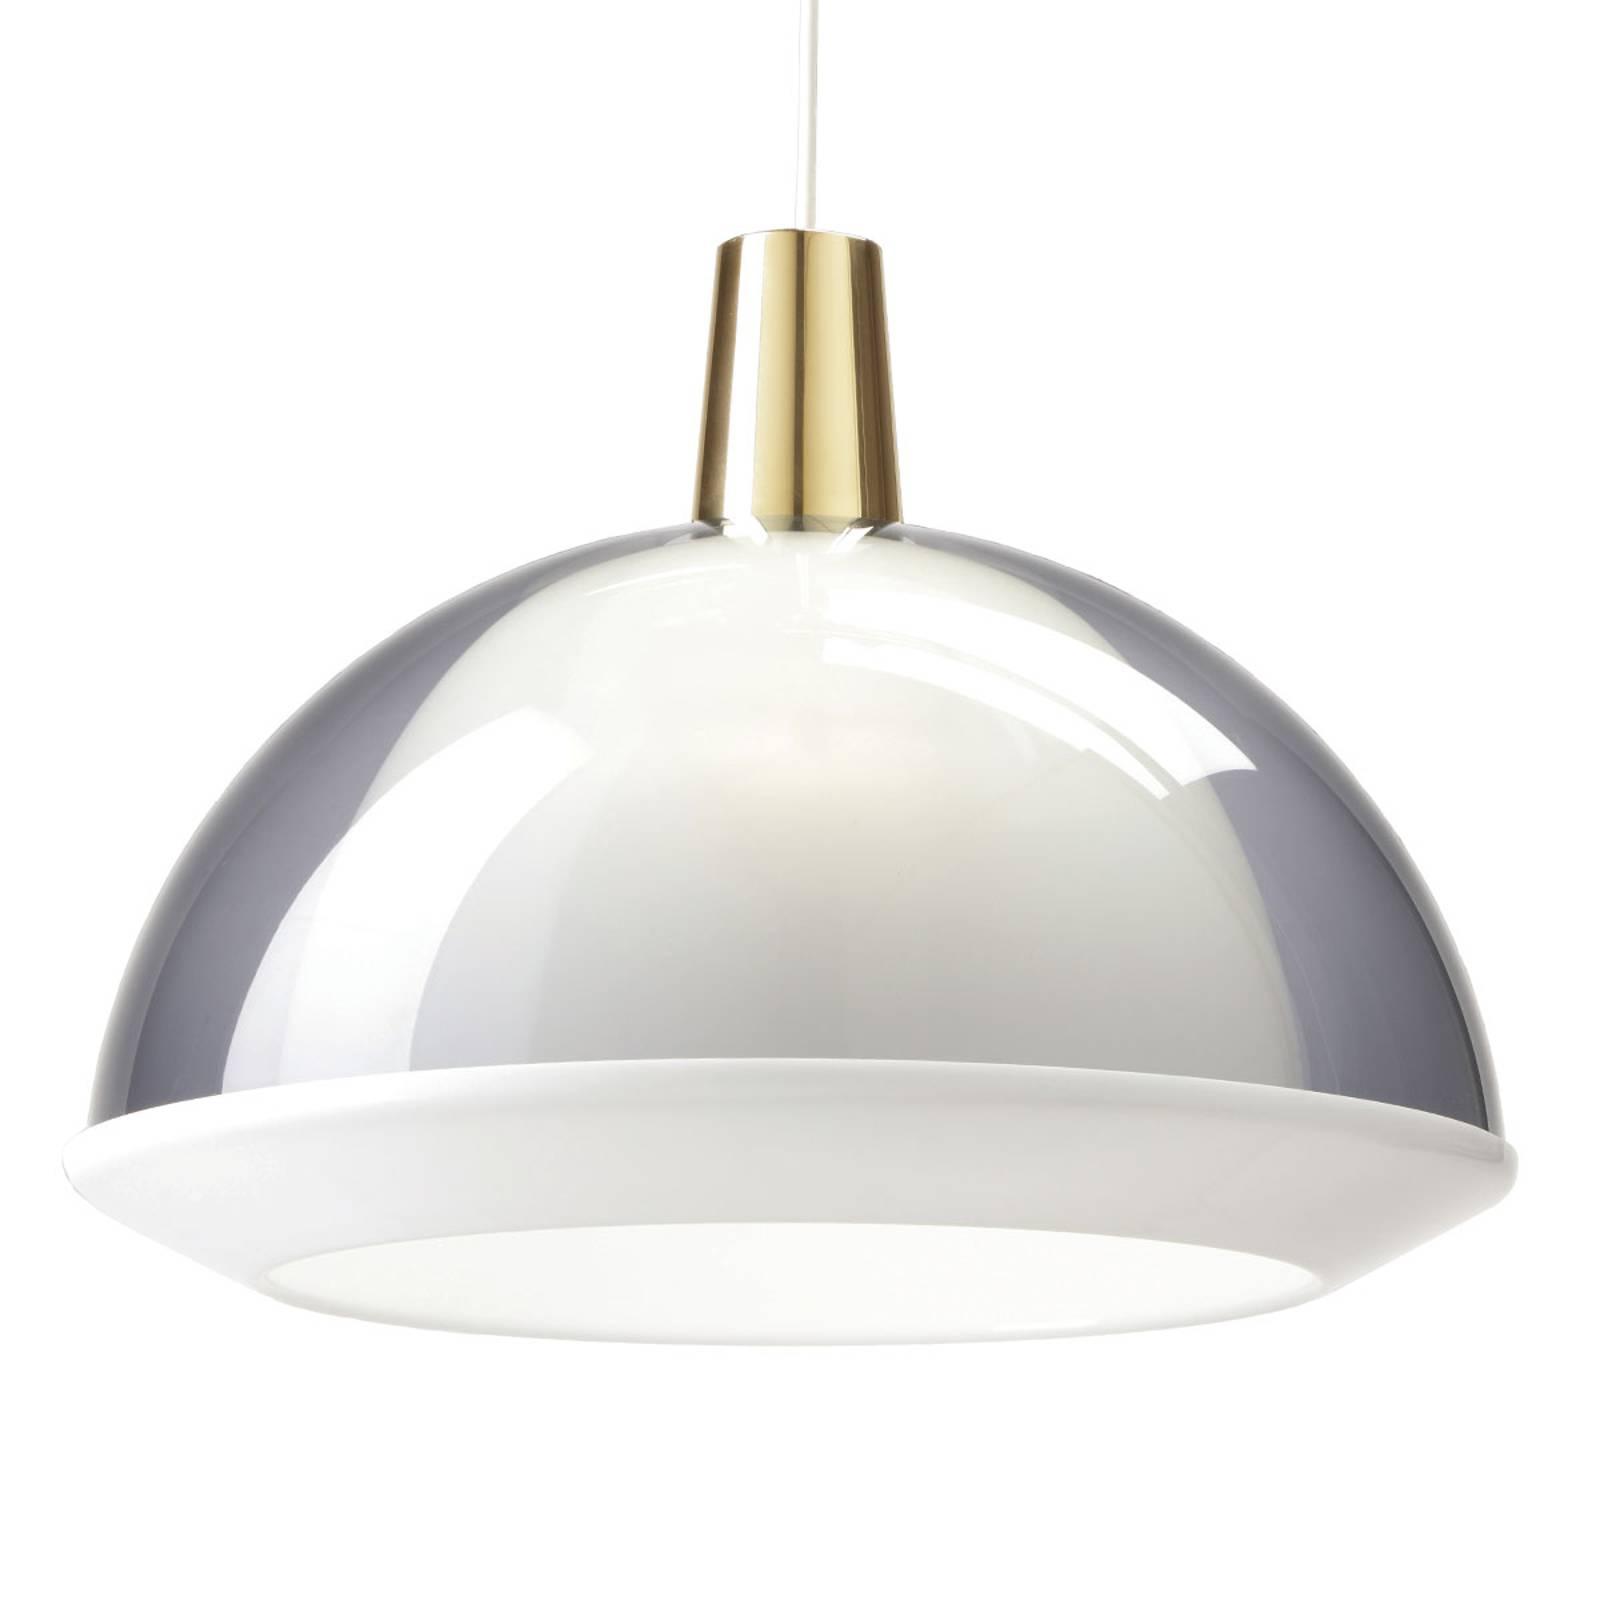 Innolux Kuplat 400 hanglamp 40 cm rookgrijs